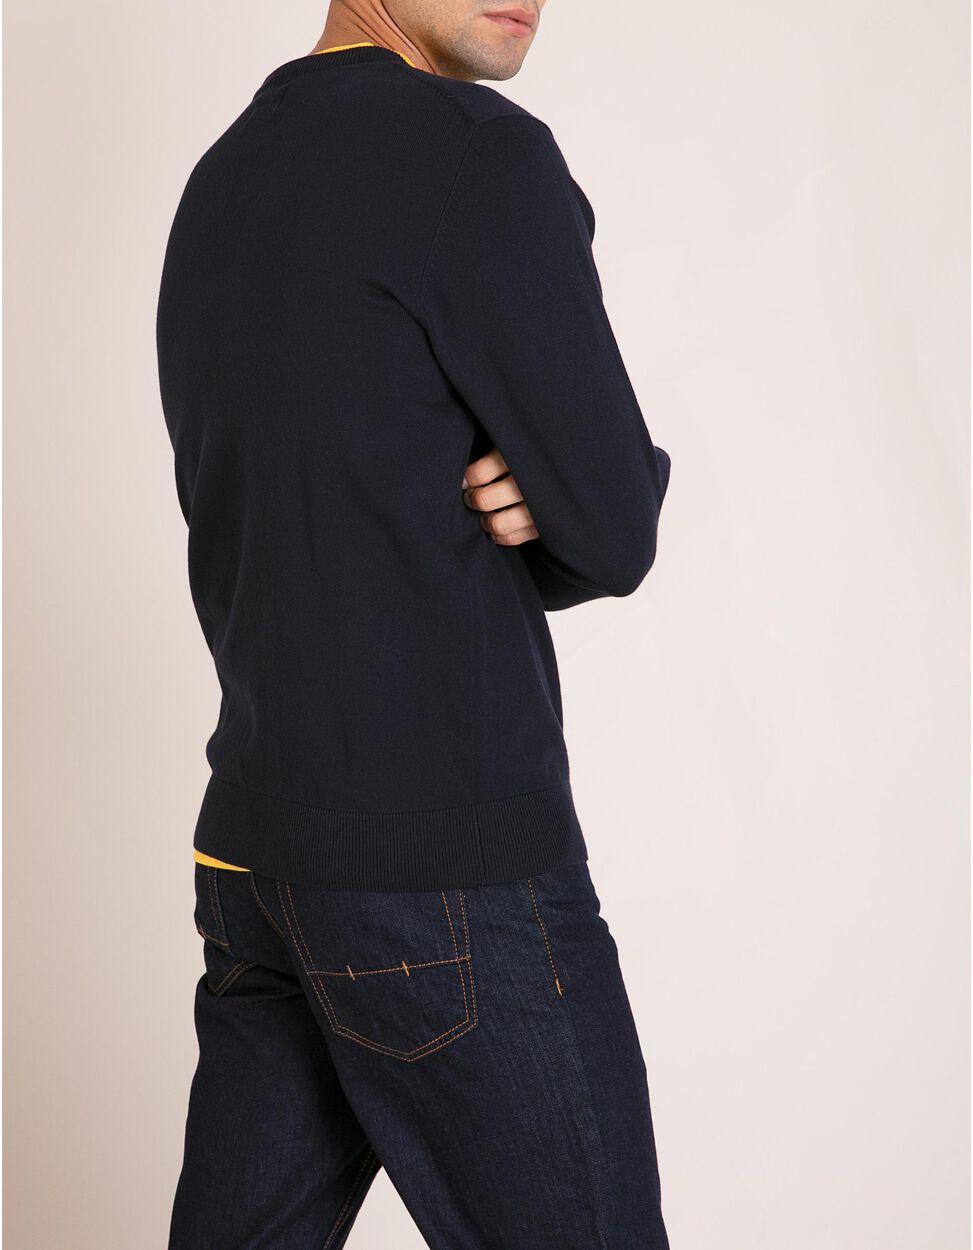 Camisola Malha Azul